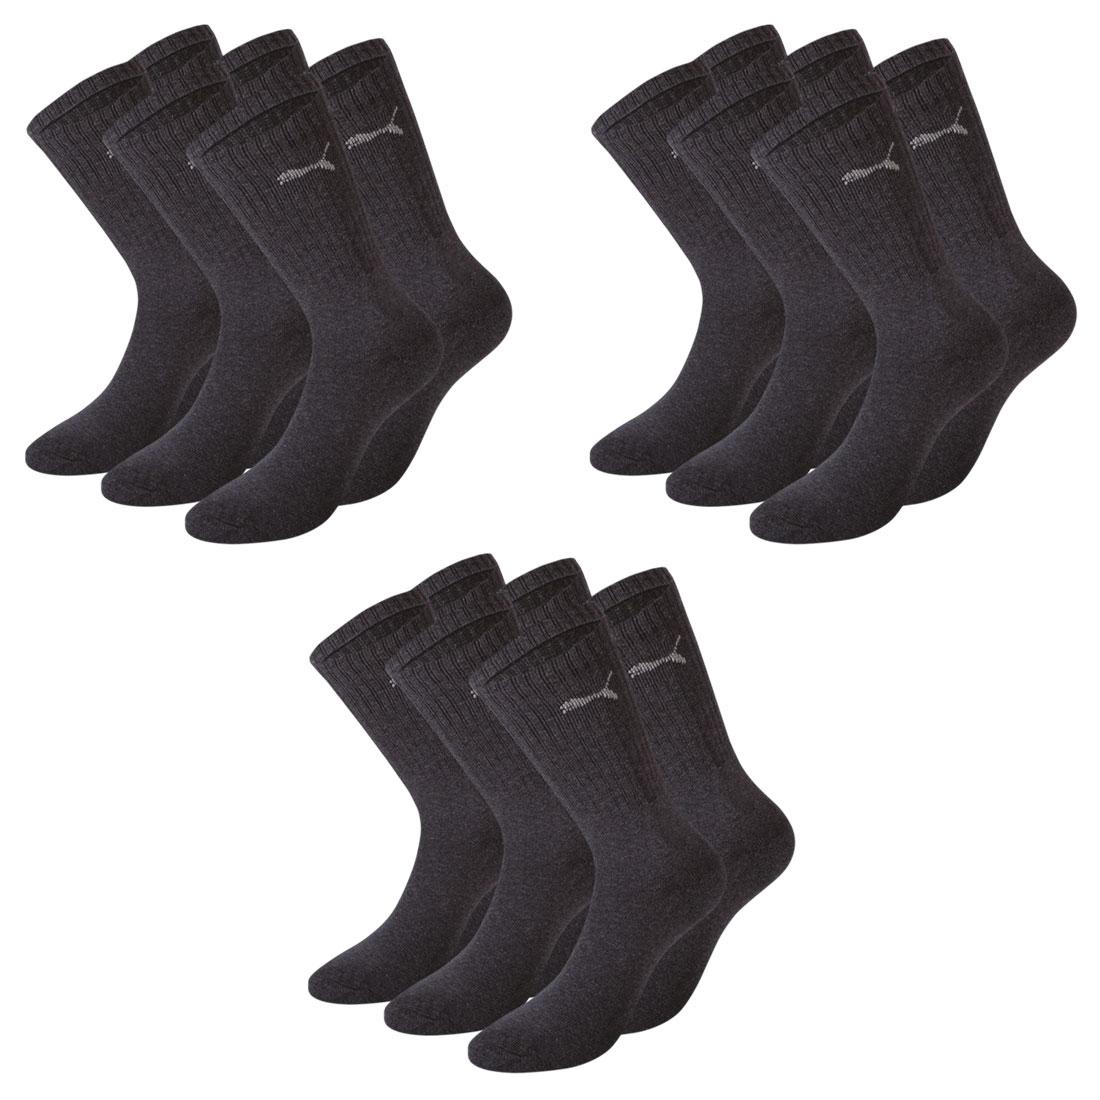 9 Paar Puma Socken, anthrazit